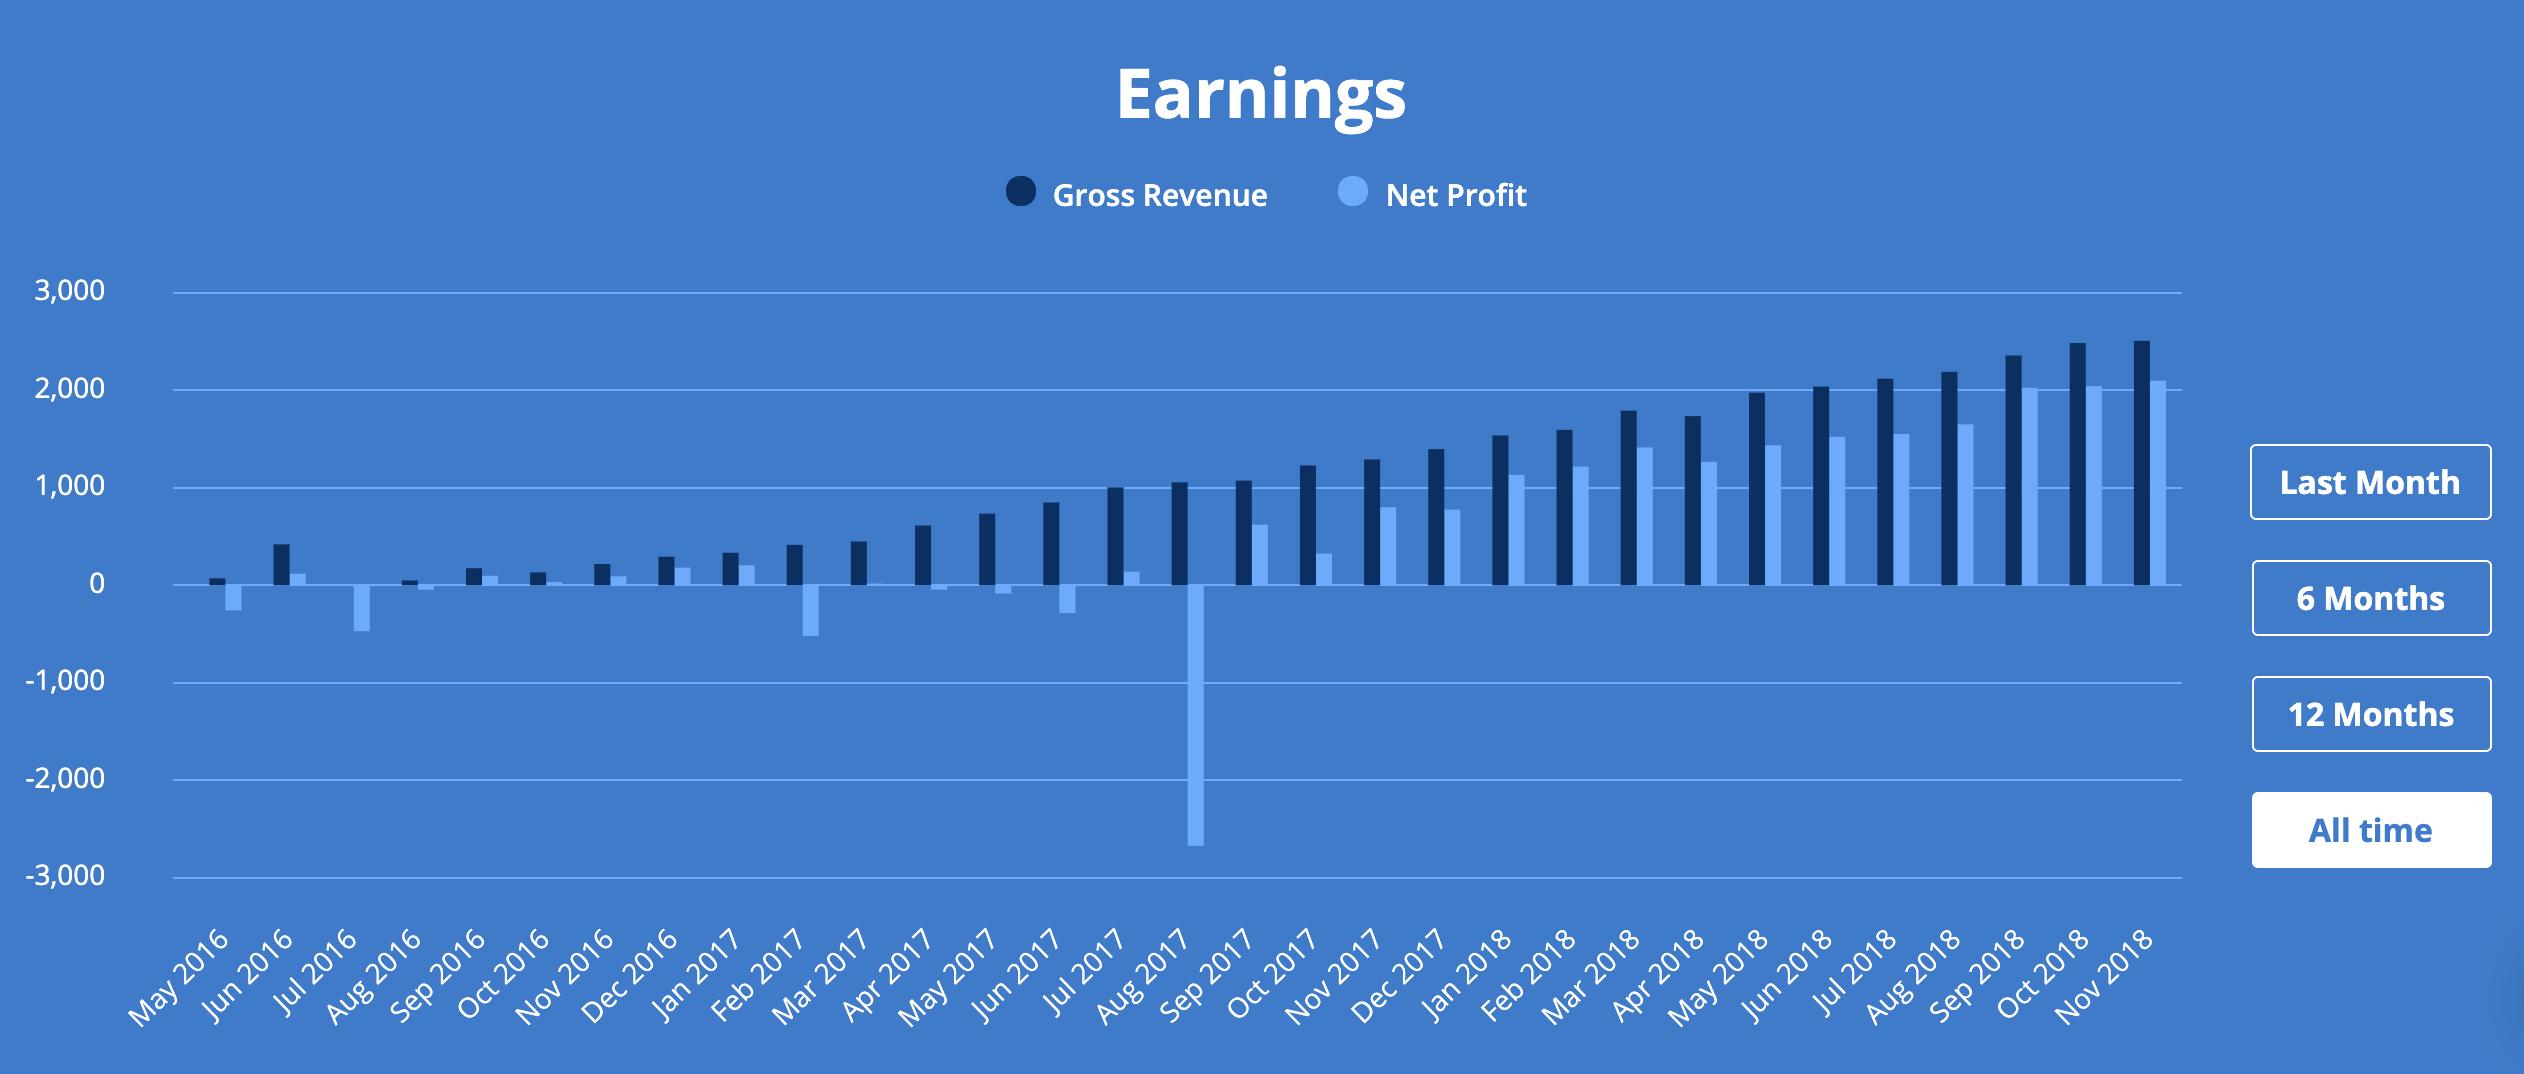 Business earnings